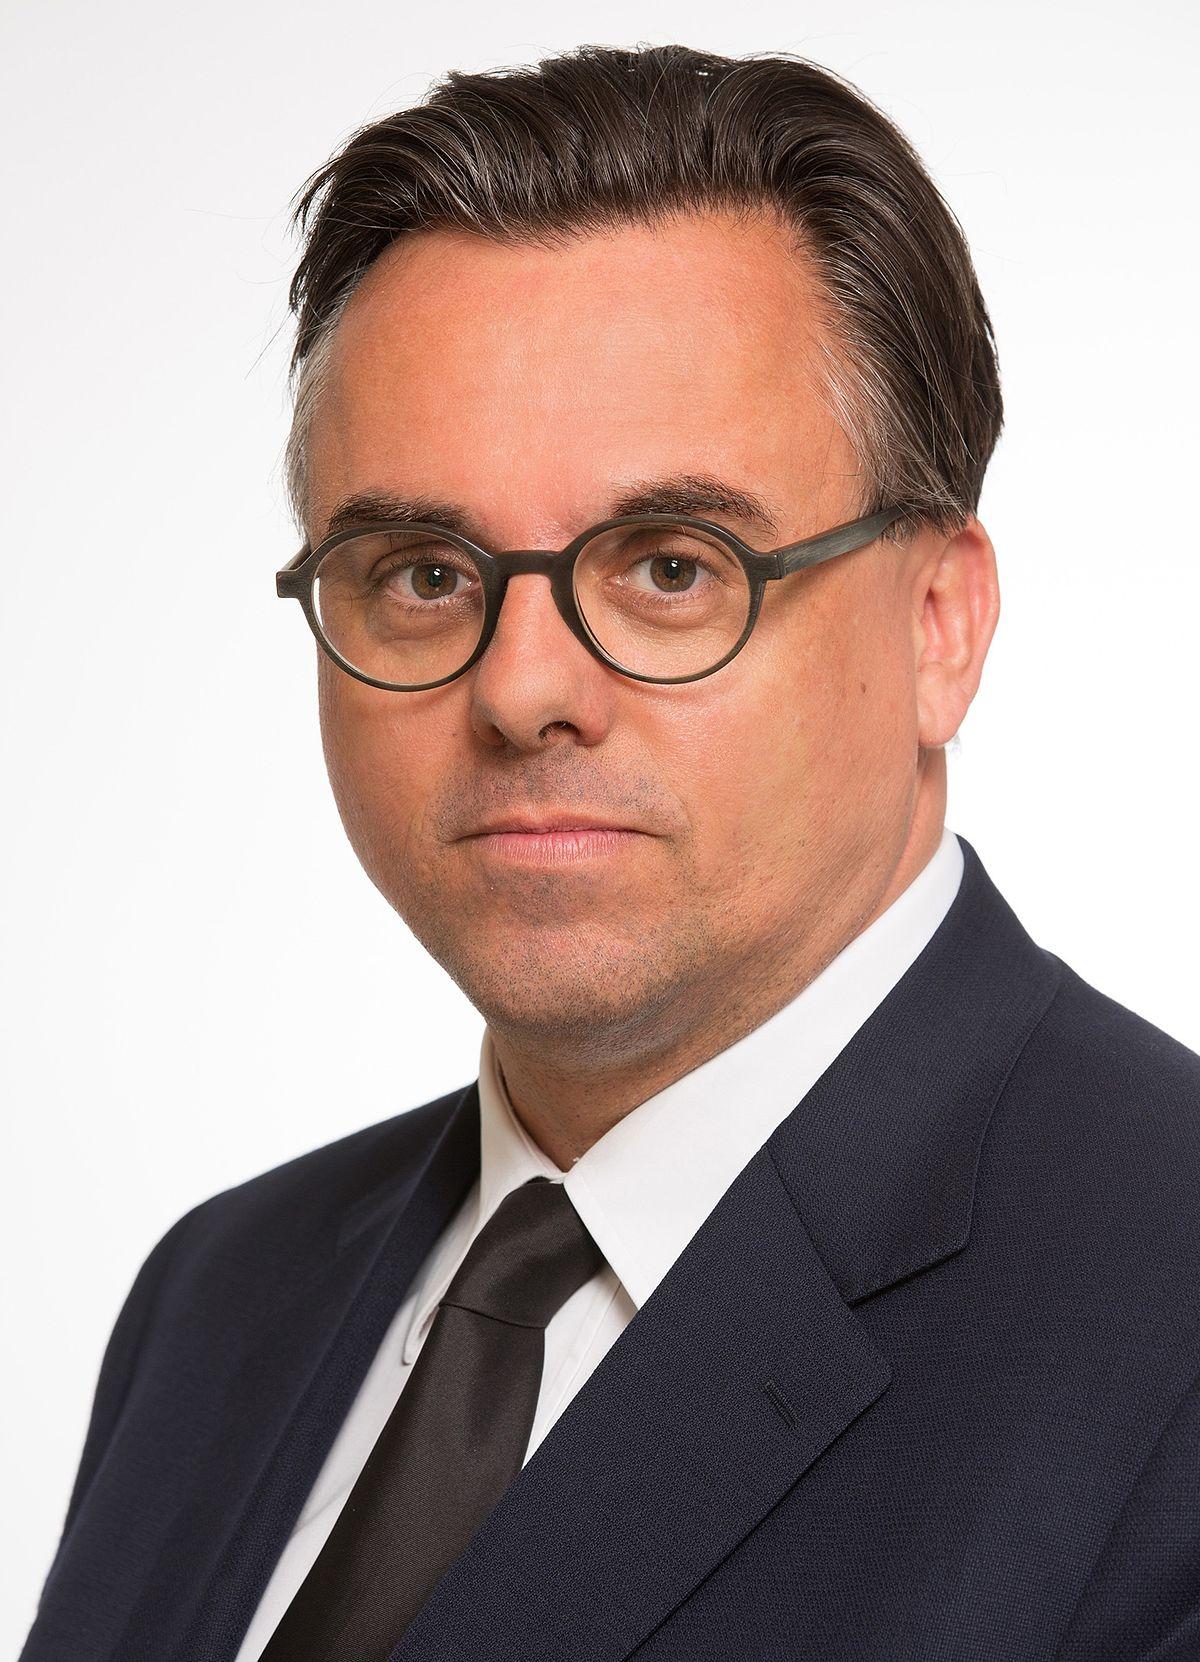 Paul Oberhammer – Wikipedia